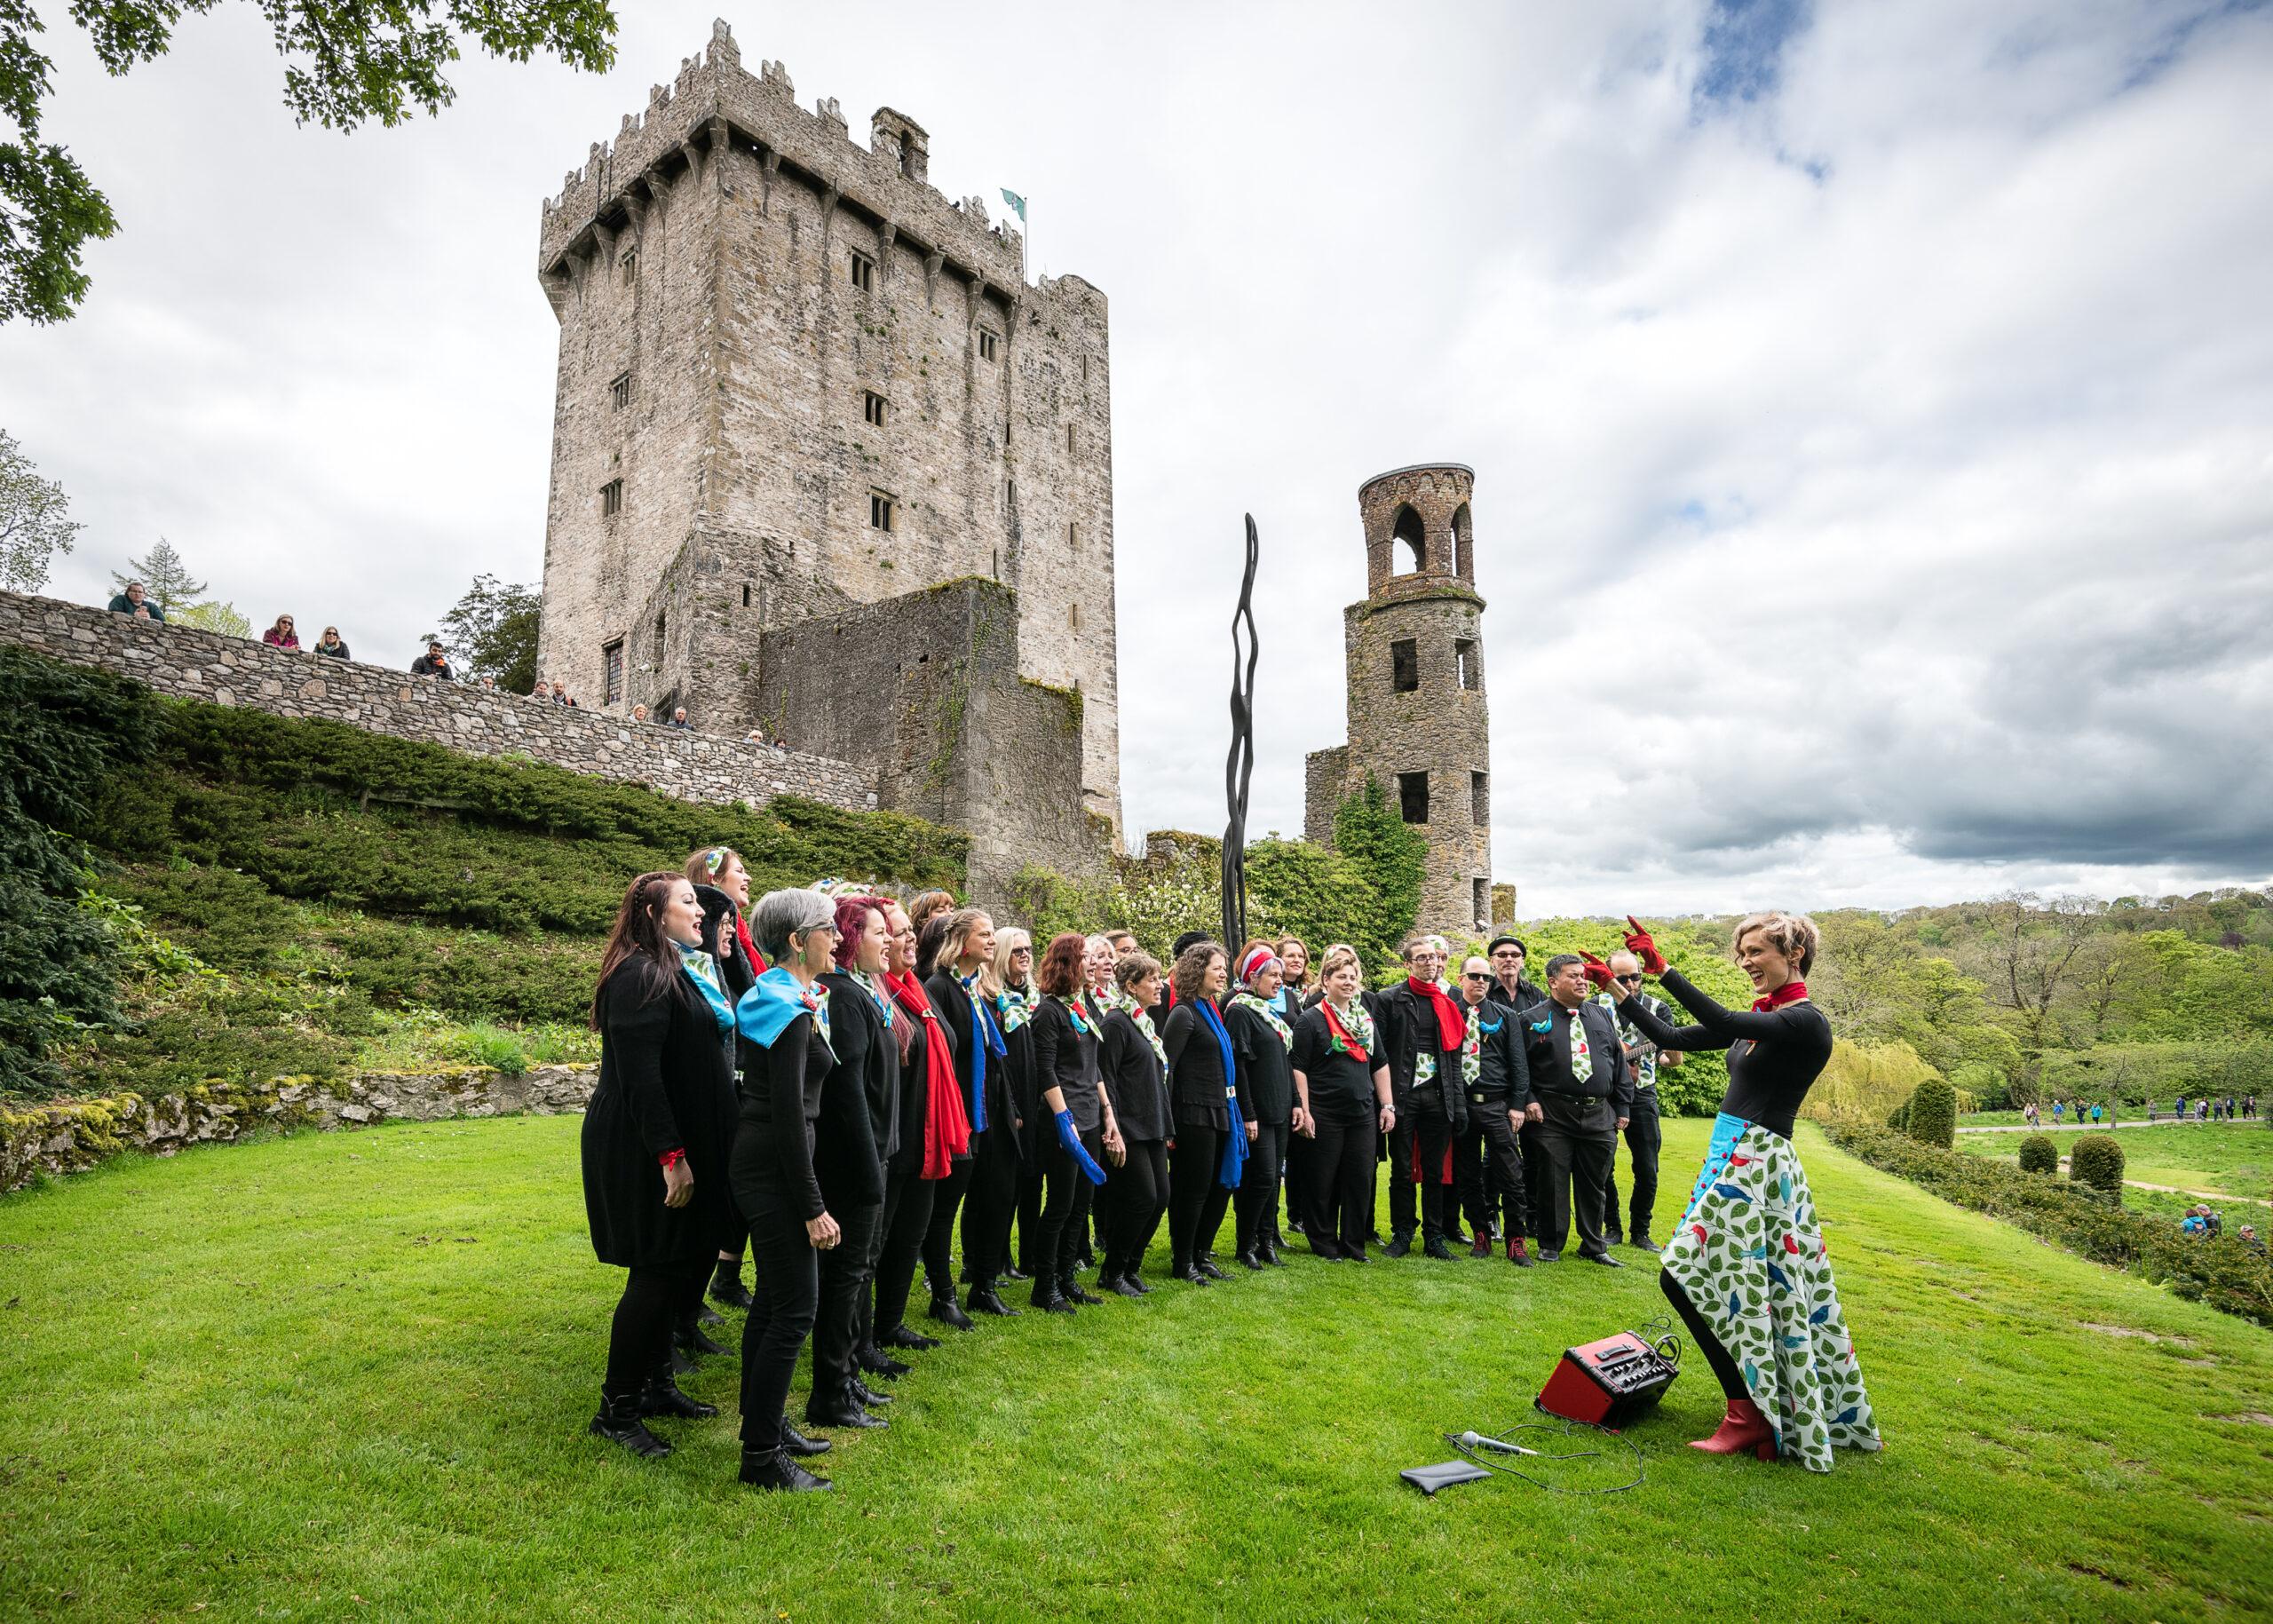 Jed Niezgoda, Ireland: Singing at Blarney Castle, Ireland, 2019, Cheep Trill Choir, Australia - Choral Trail performance at Blarney Castle, County Cork, Ireland during the 2019 Cork International Choral Festival.